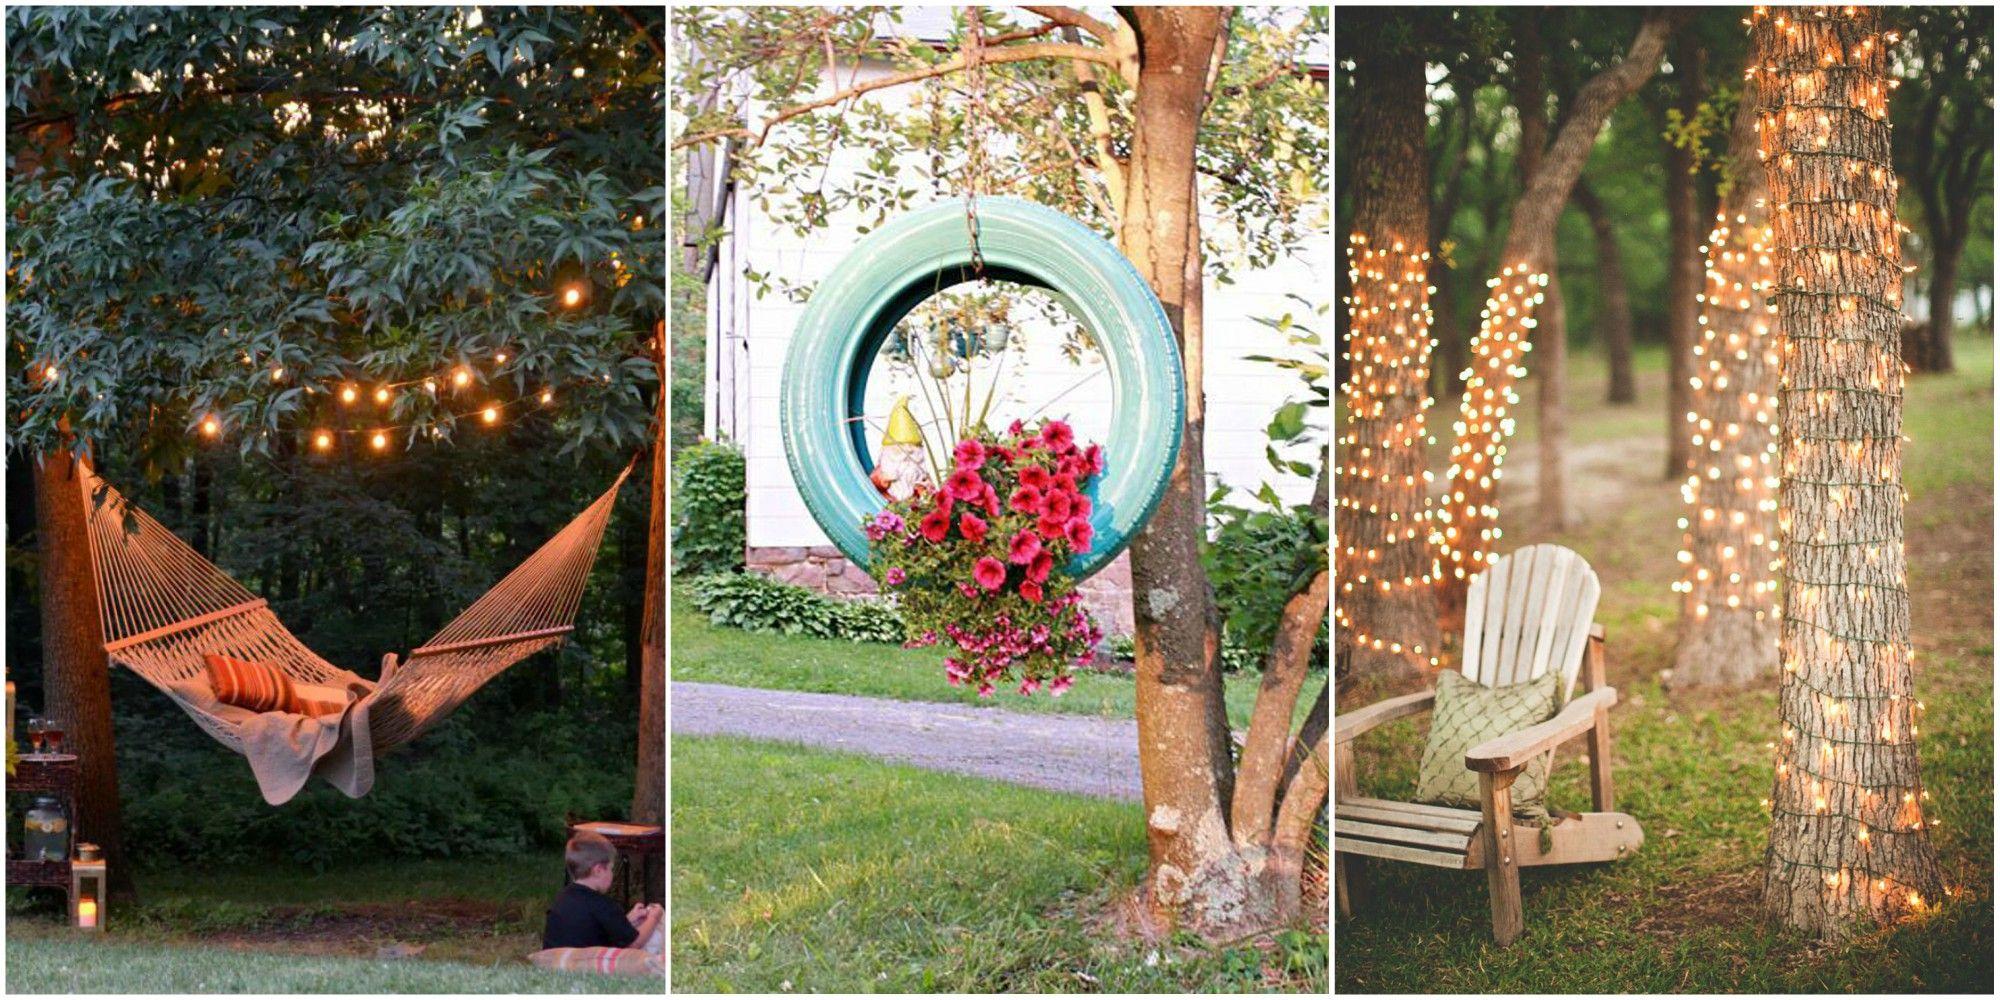 backyard decorating ideas & 67 DIY Backyard Design Ideas - DIY Backyard Decor Tips